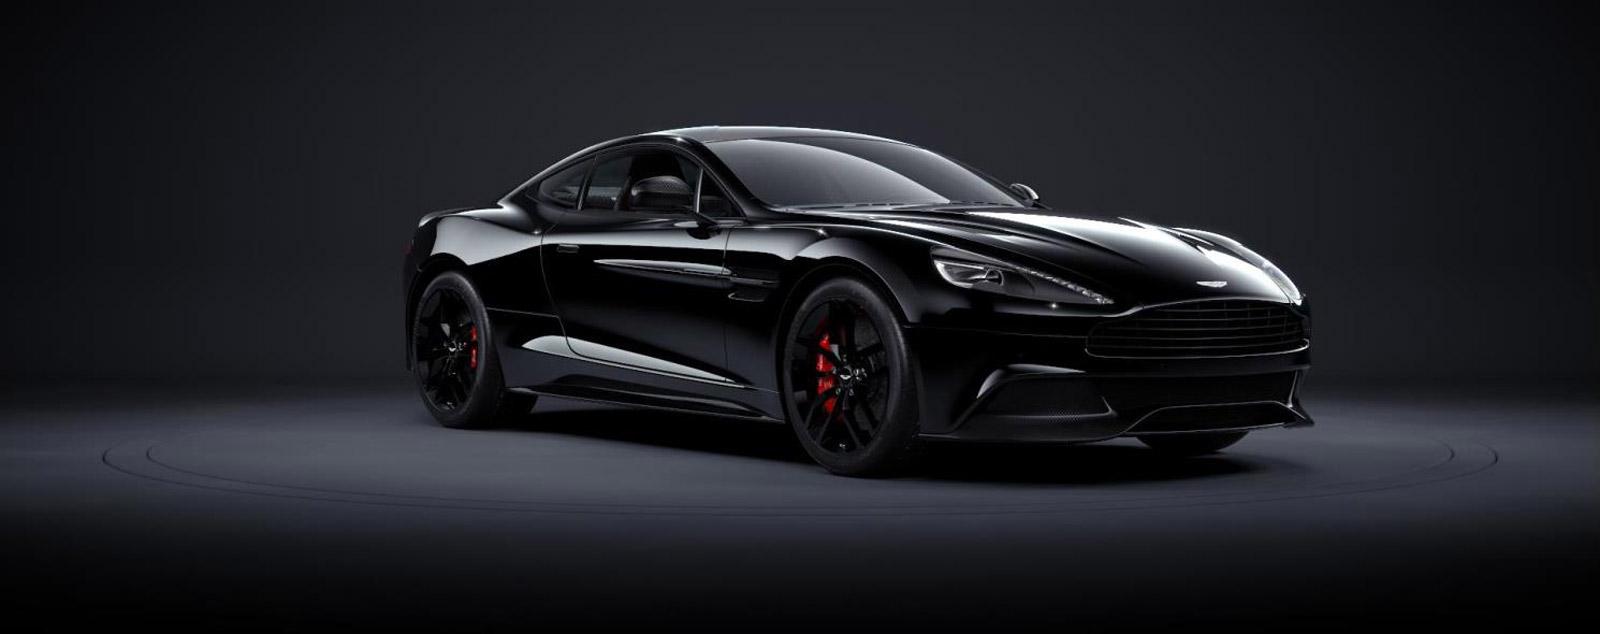 2015 Aston Martin Vanquish Gets Carbon Special Edition ...